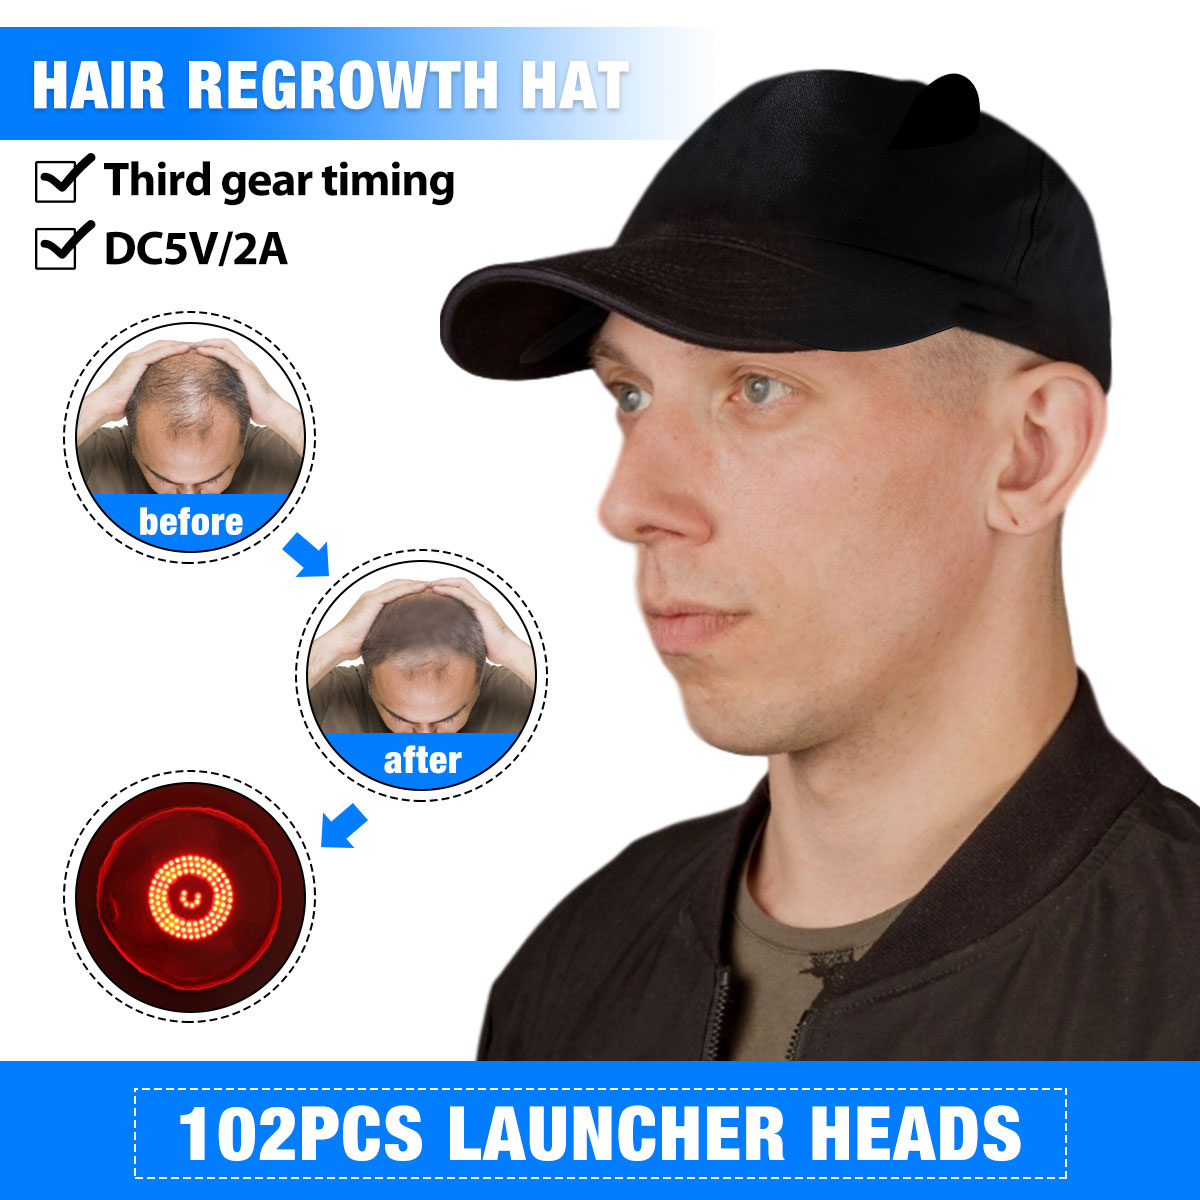 DC5V Hair Growth Laser Helmet 102Pcs Light Chips Anti Hair Loss Hair Growth Cap Hair Loss Therapy Decive Hair Regrowth Machine